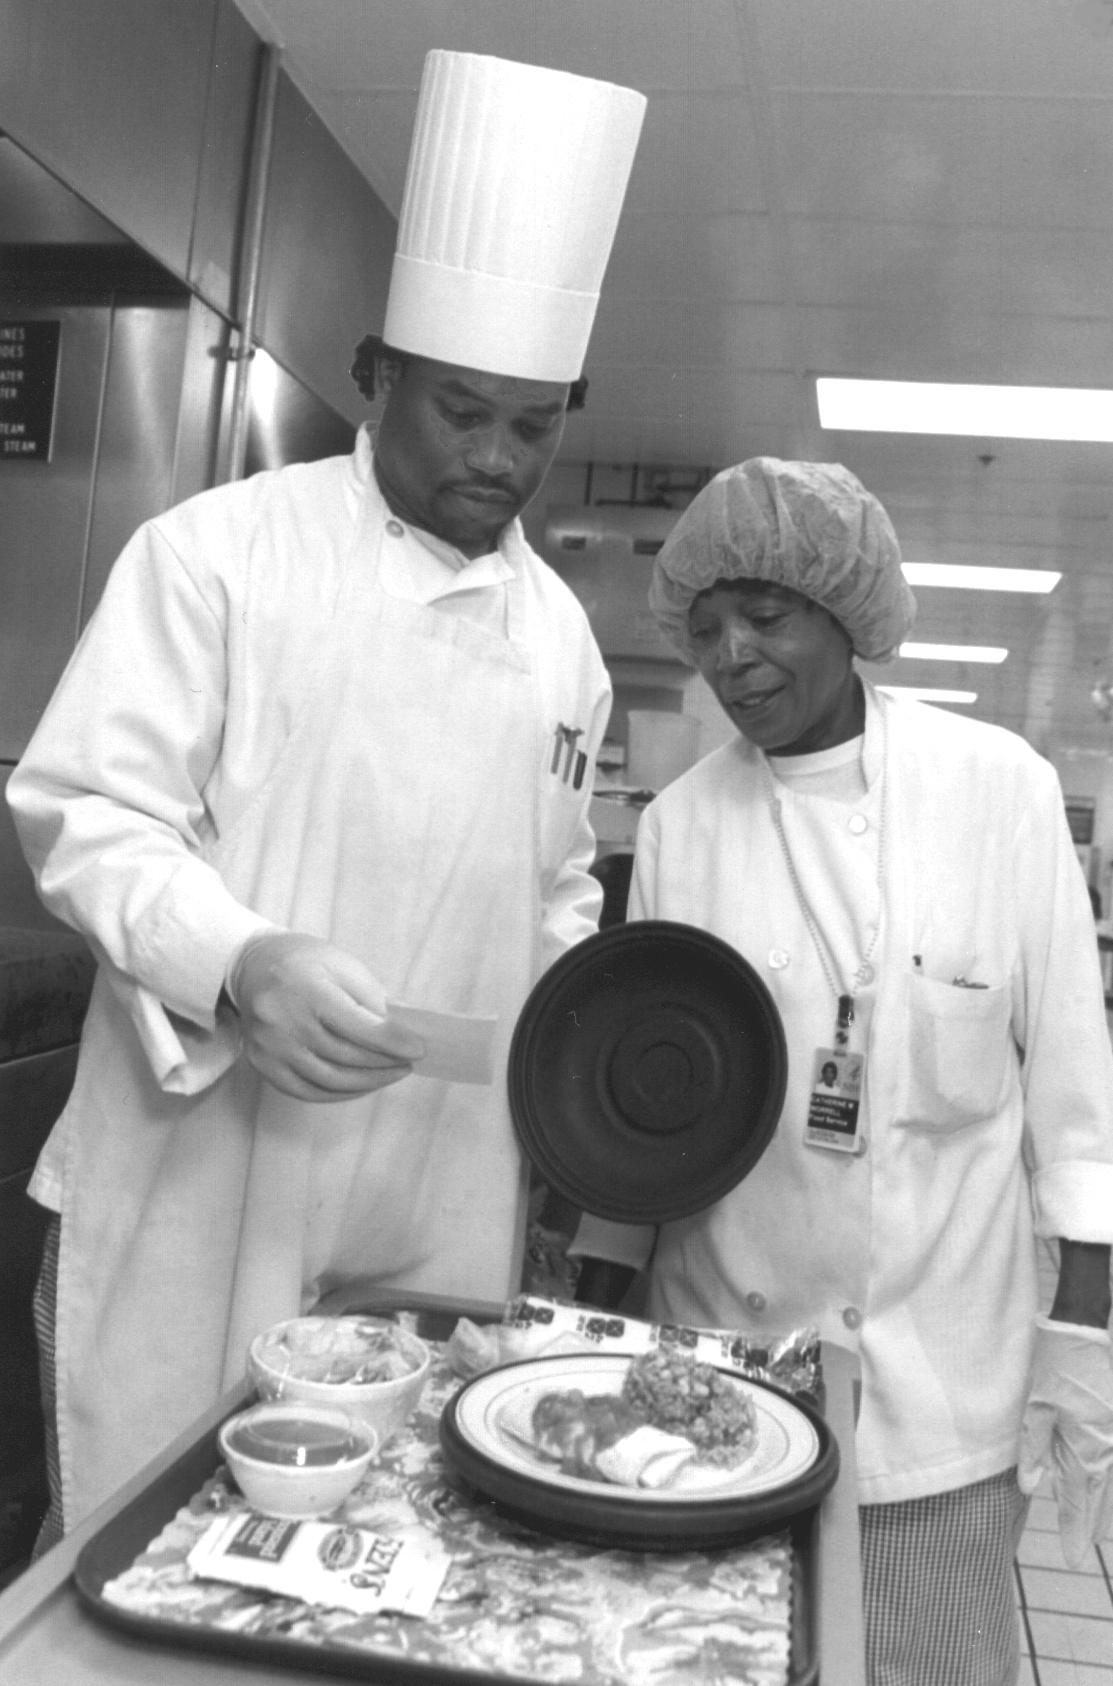 photo of dietary staff preparing food